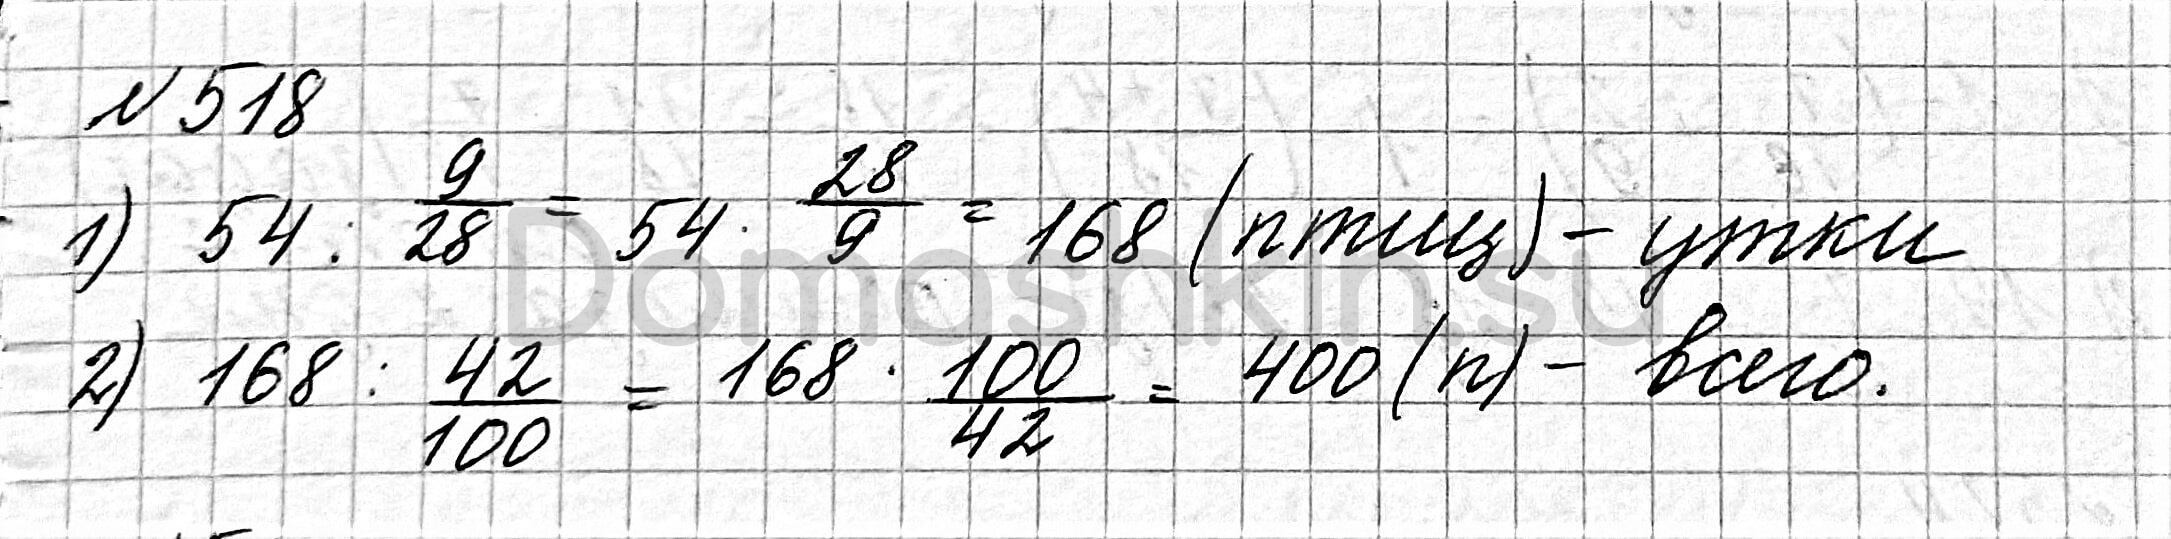 Математика 6 класс учебник Мерзляк номер 518 решение